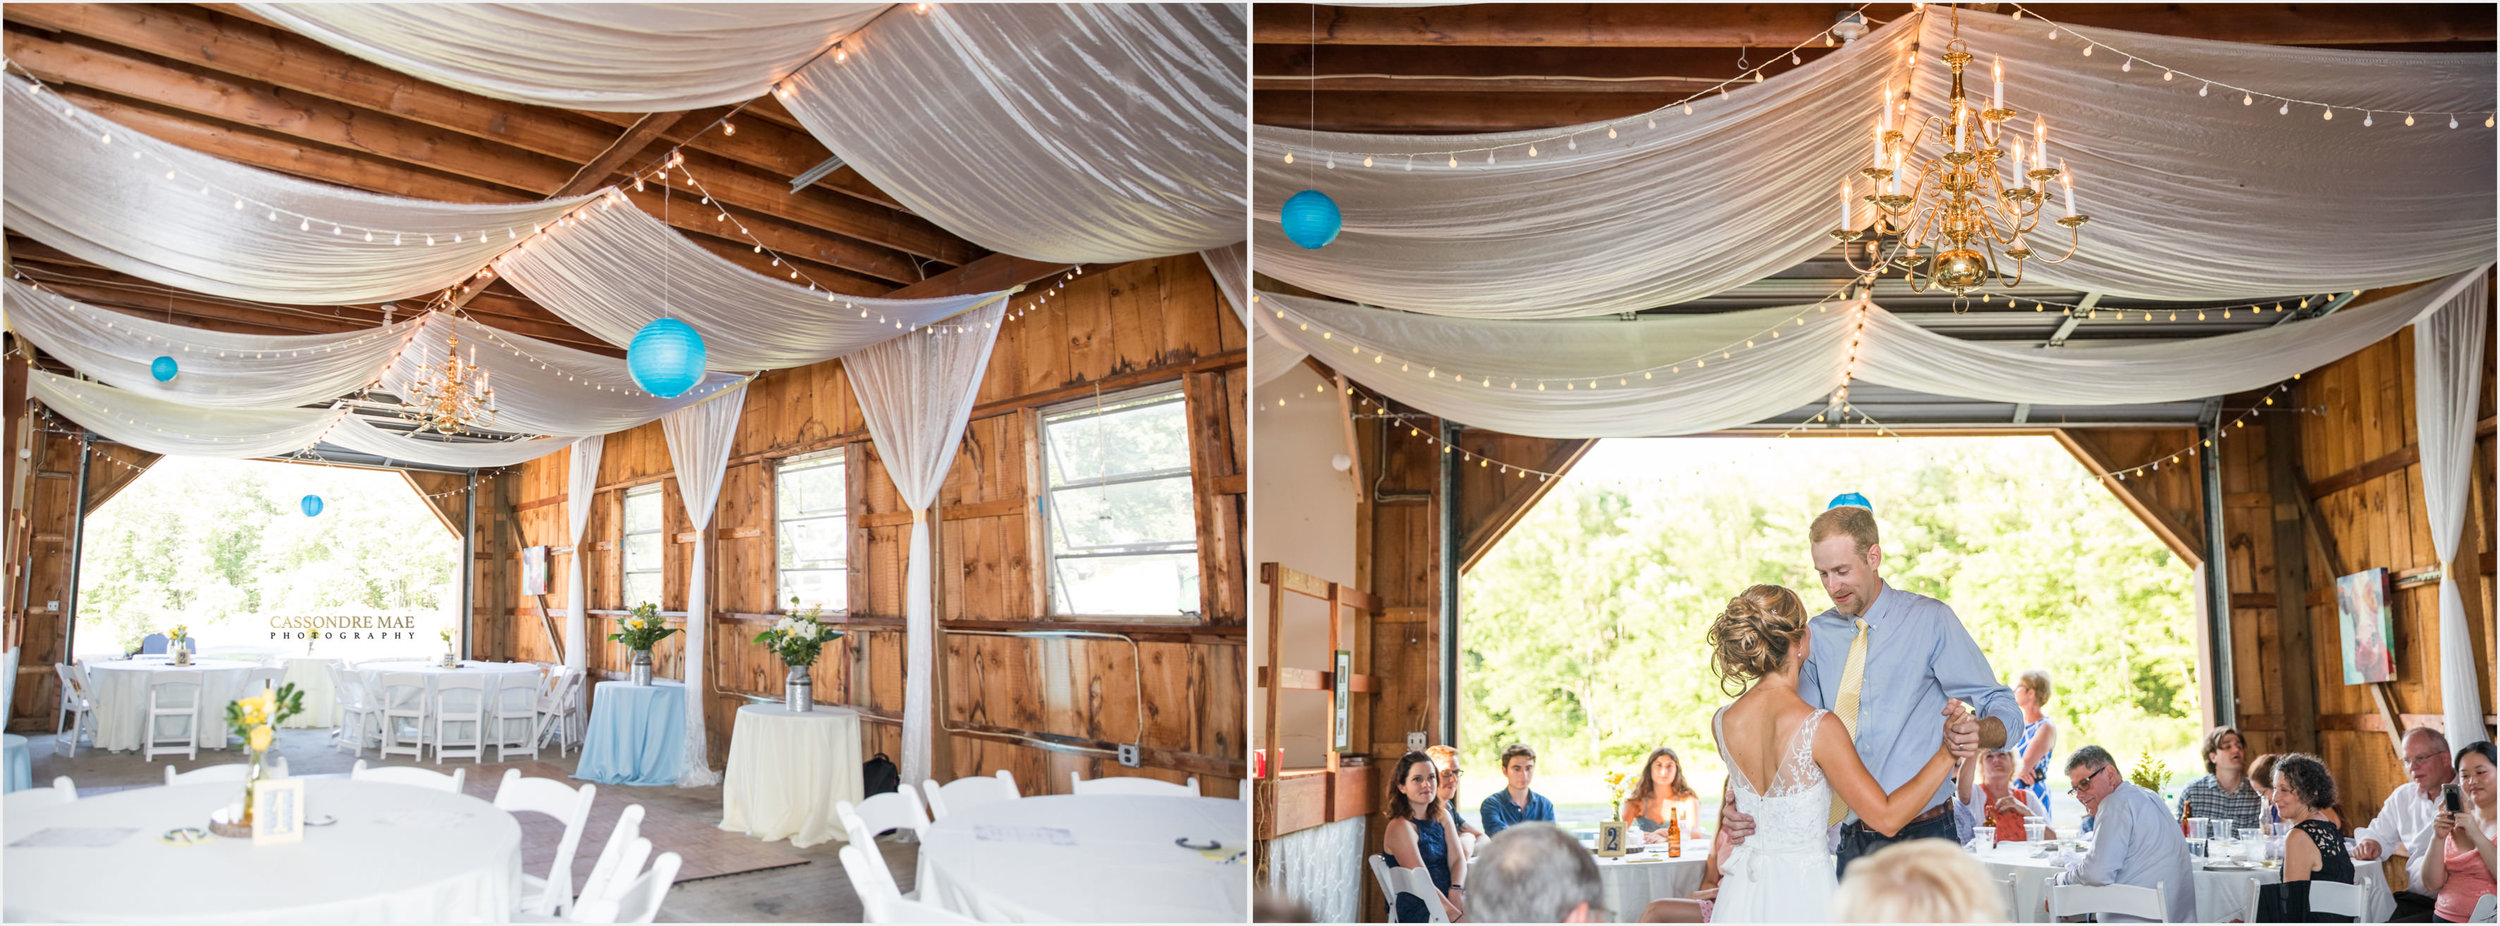 Cassondre Mae Photography Warwick NY Wedding Photographer -23.jpg